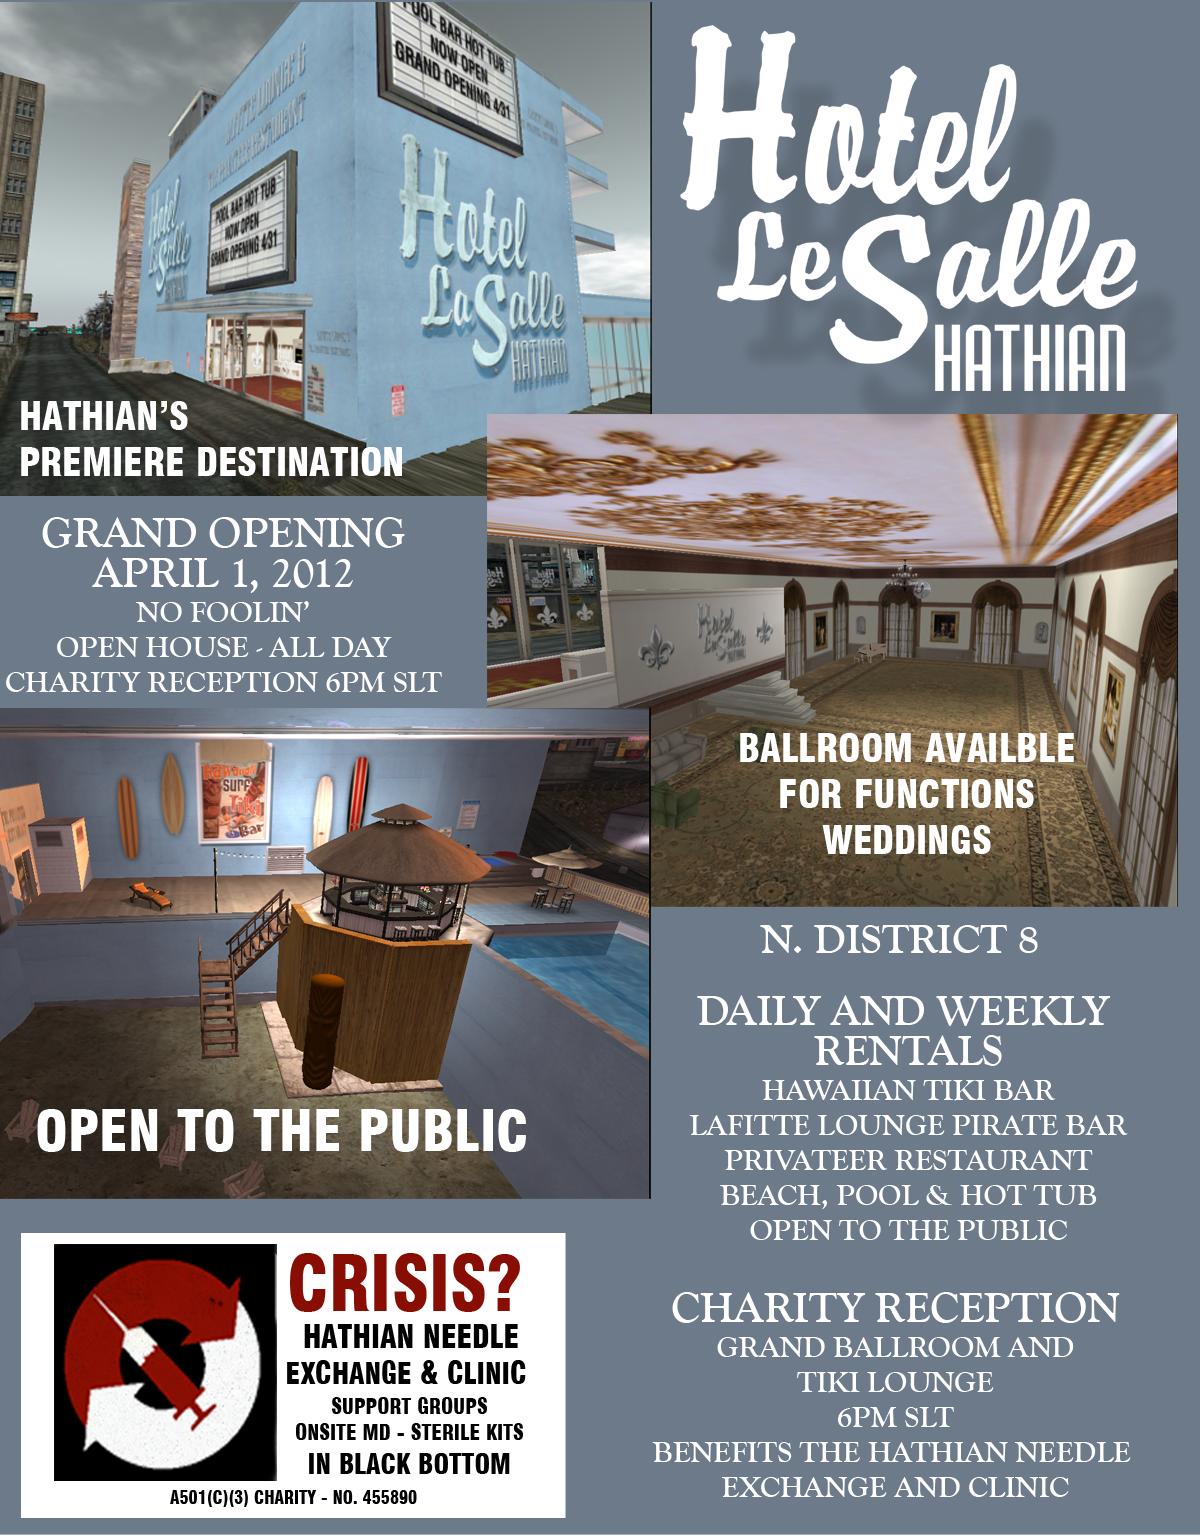 Grand Opening Hotel La Salle